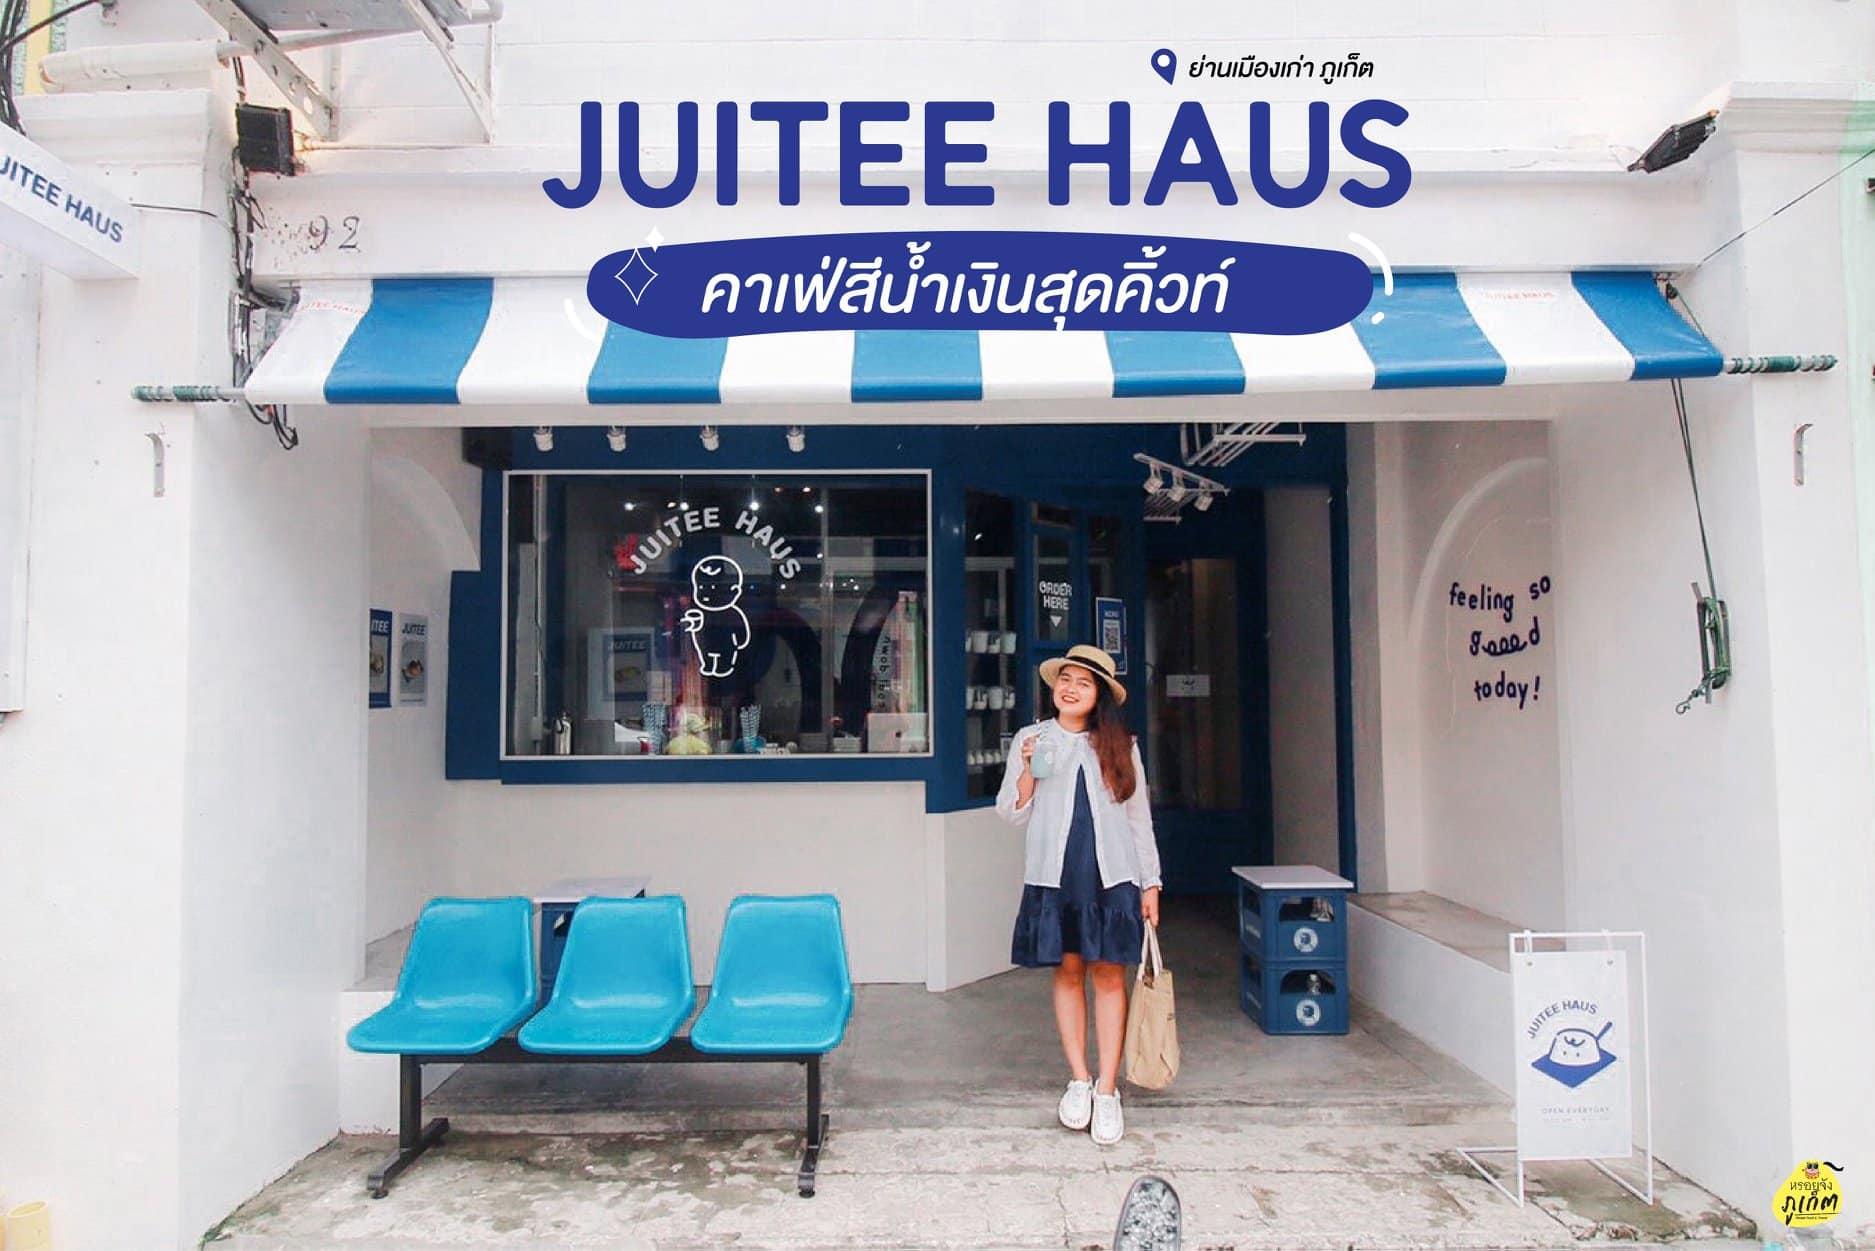 Juitee Haus – จุยตี่ เฮ้าส์ ภูเภ็ตโอลทาวน์